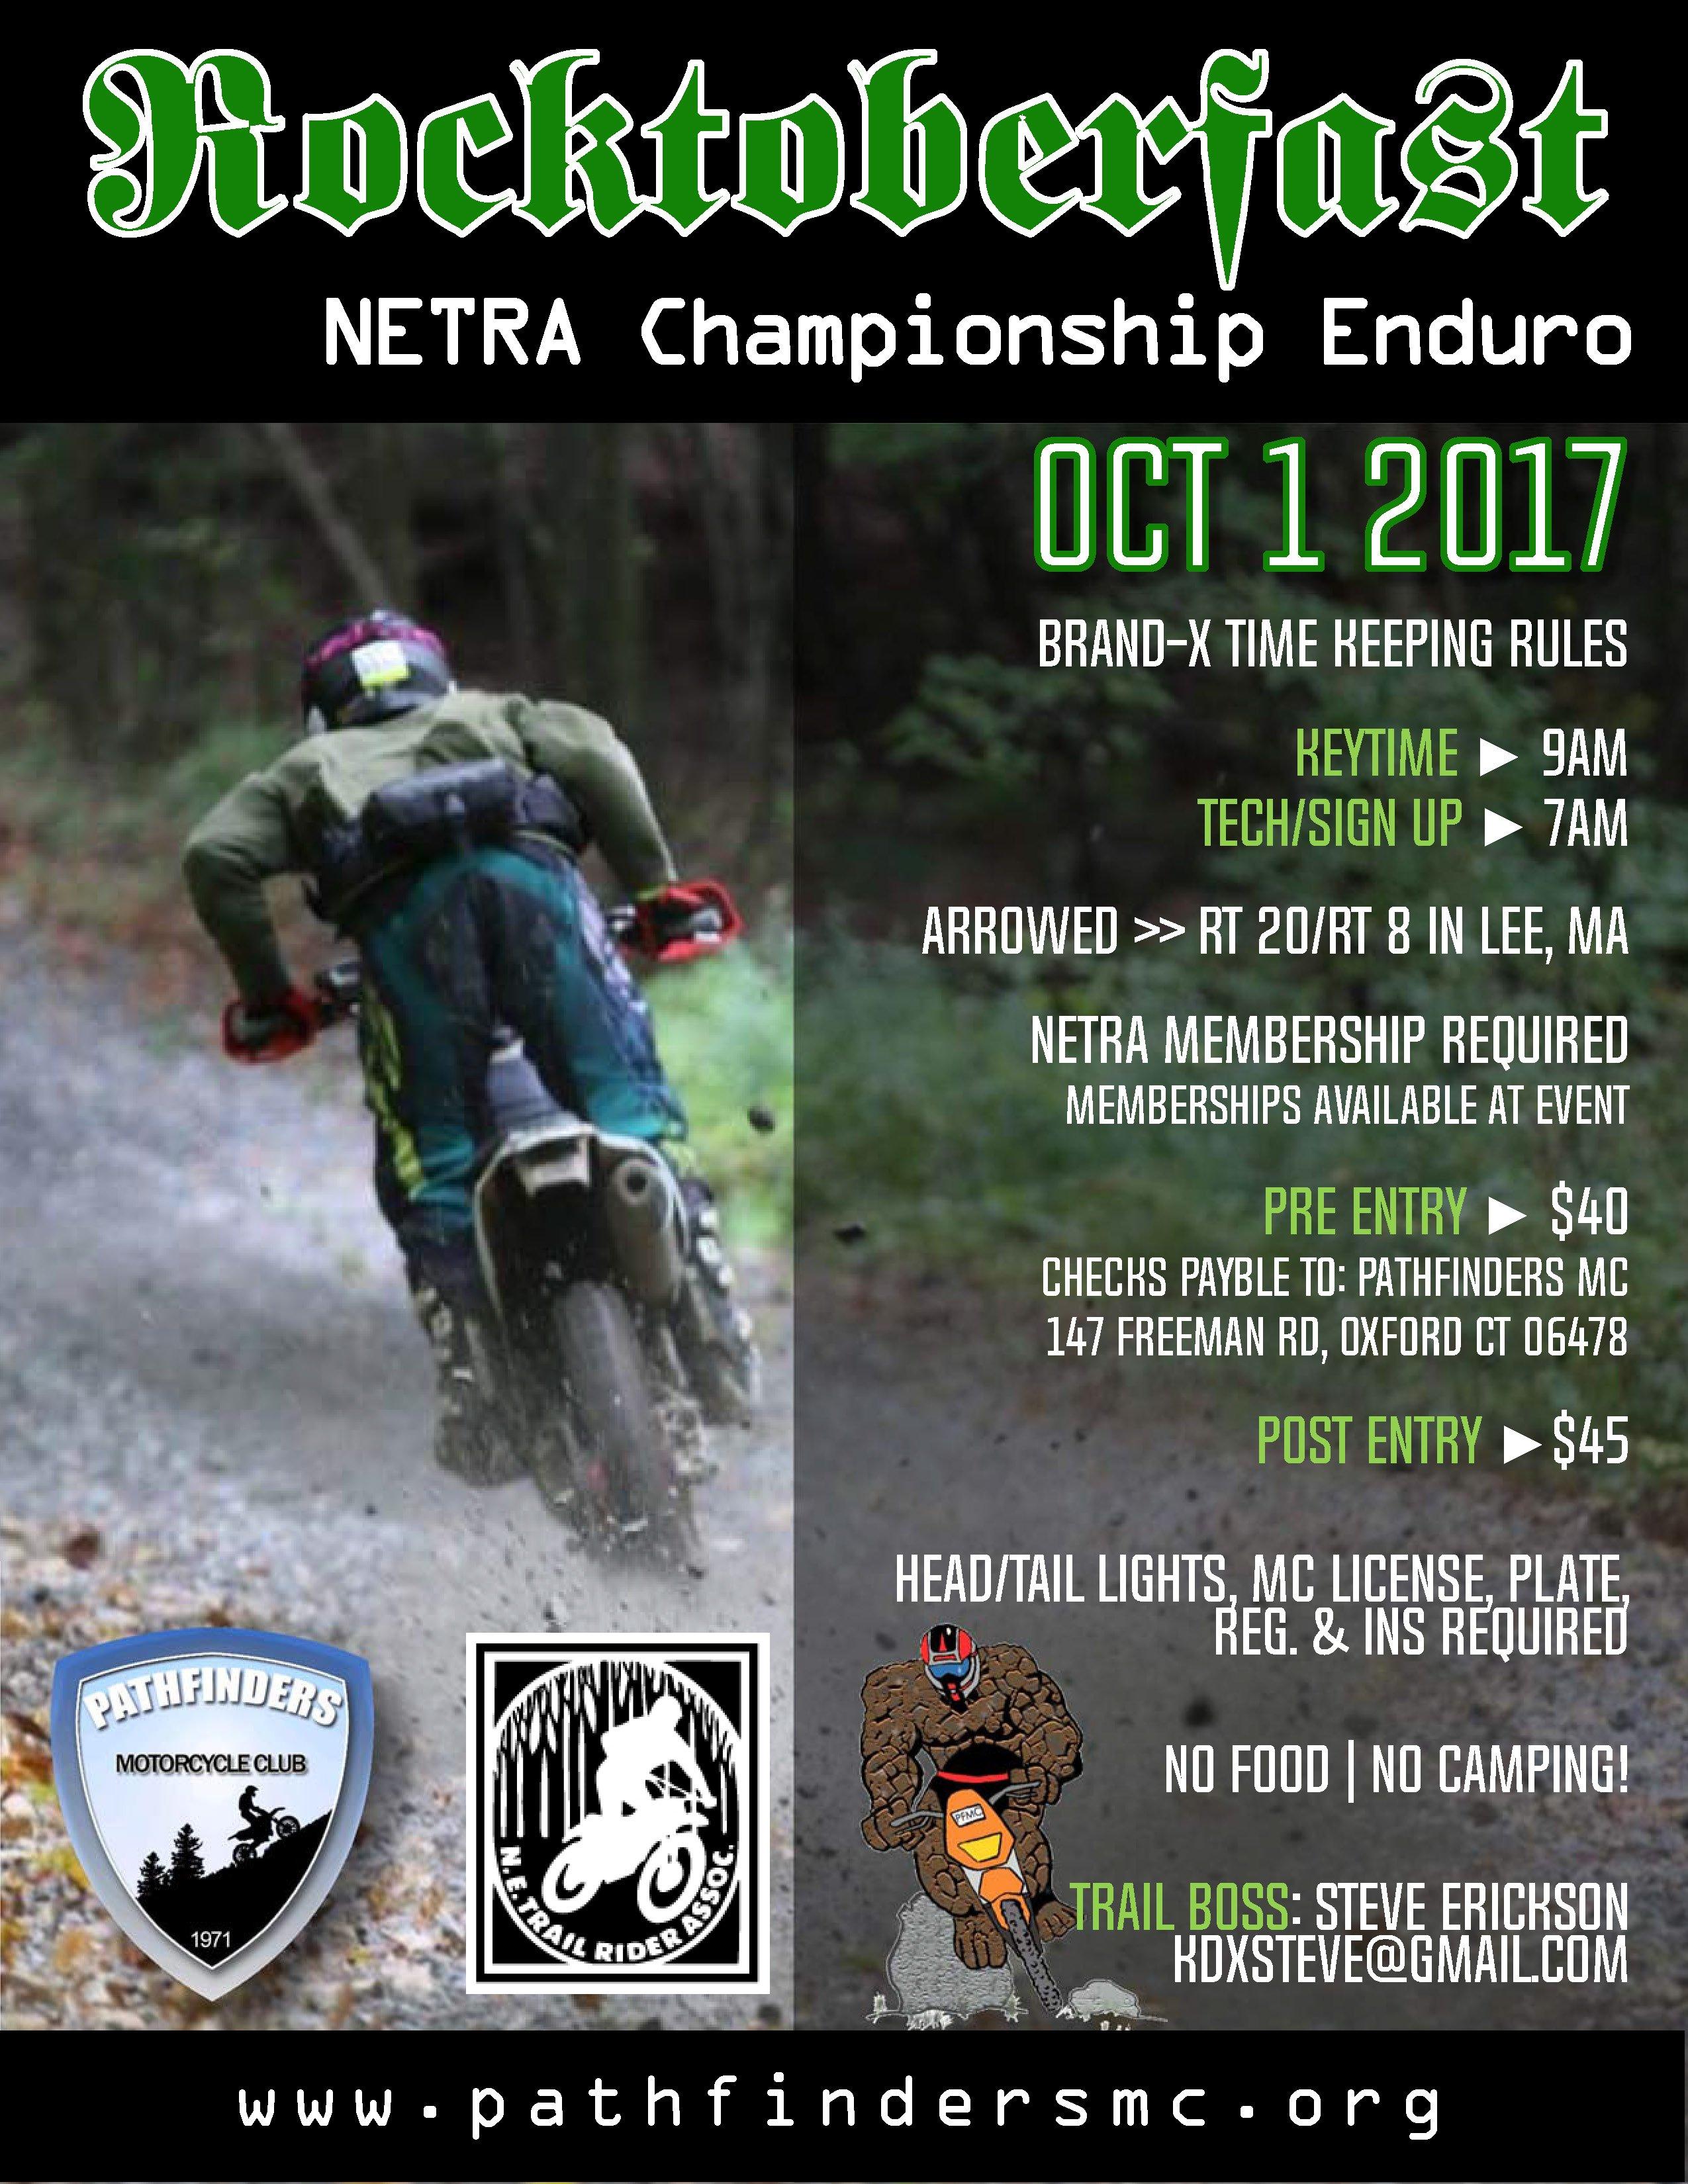 Rocktoberfast Enduro @ October Mountain State Forest | Lee | Massachusetts | United States